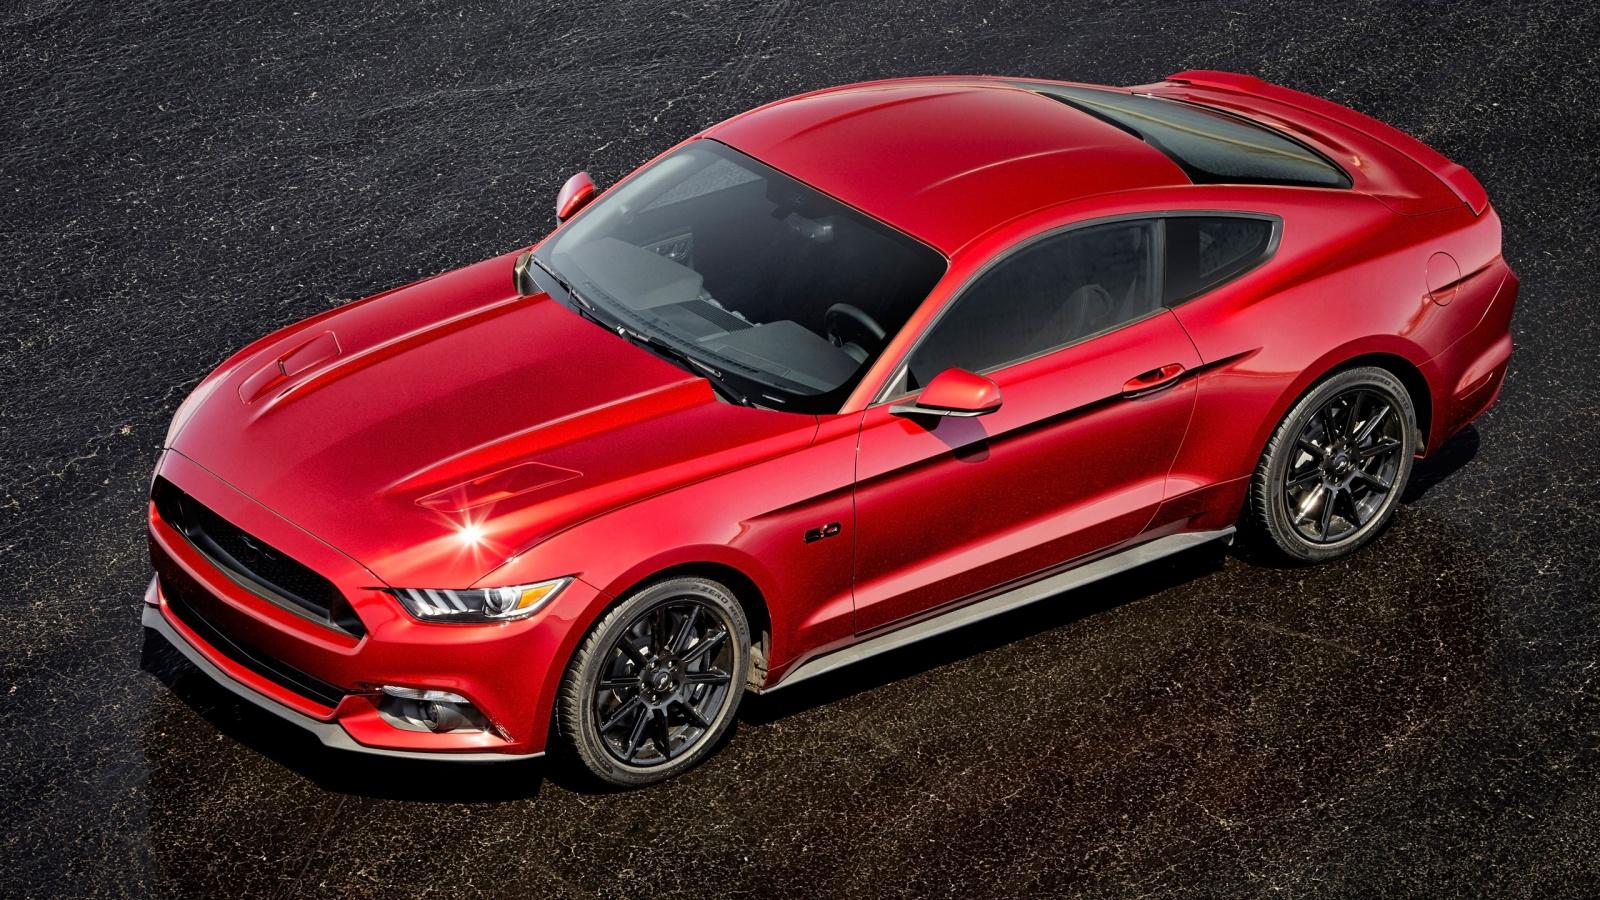 2016 Ford Mustang GT Wallpaper HD Car Wallpapers 1600x900